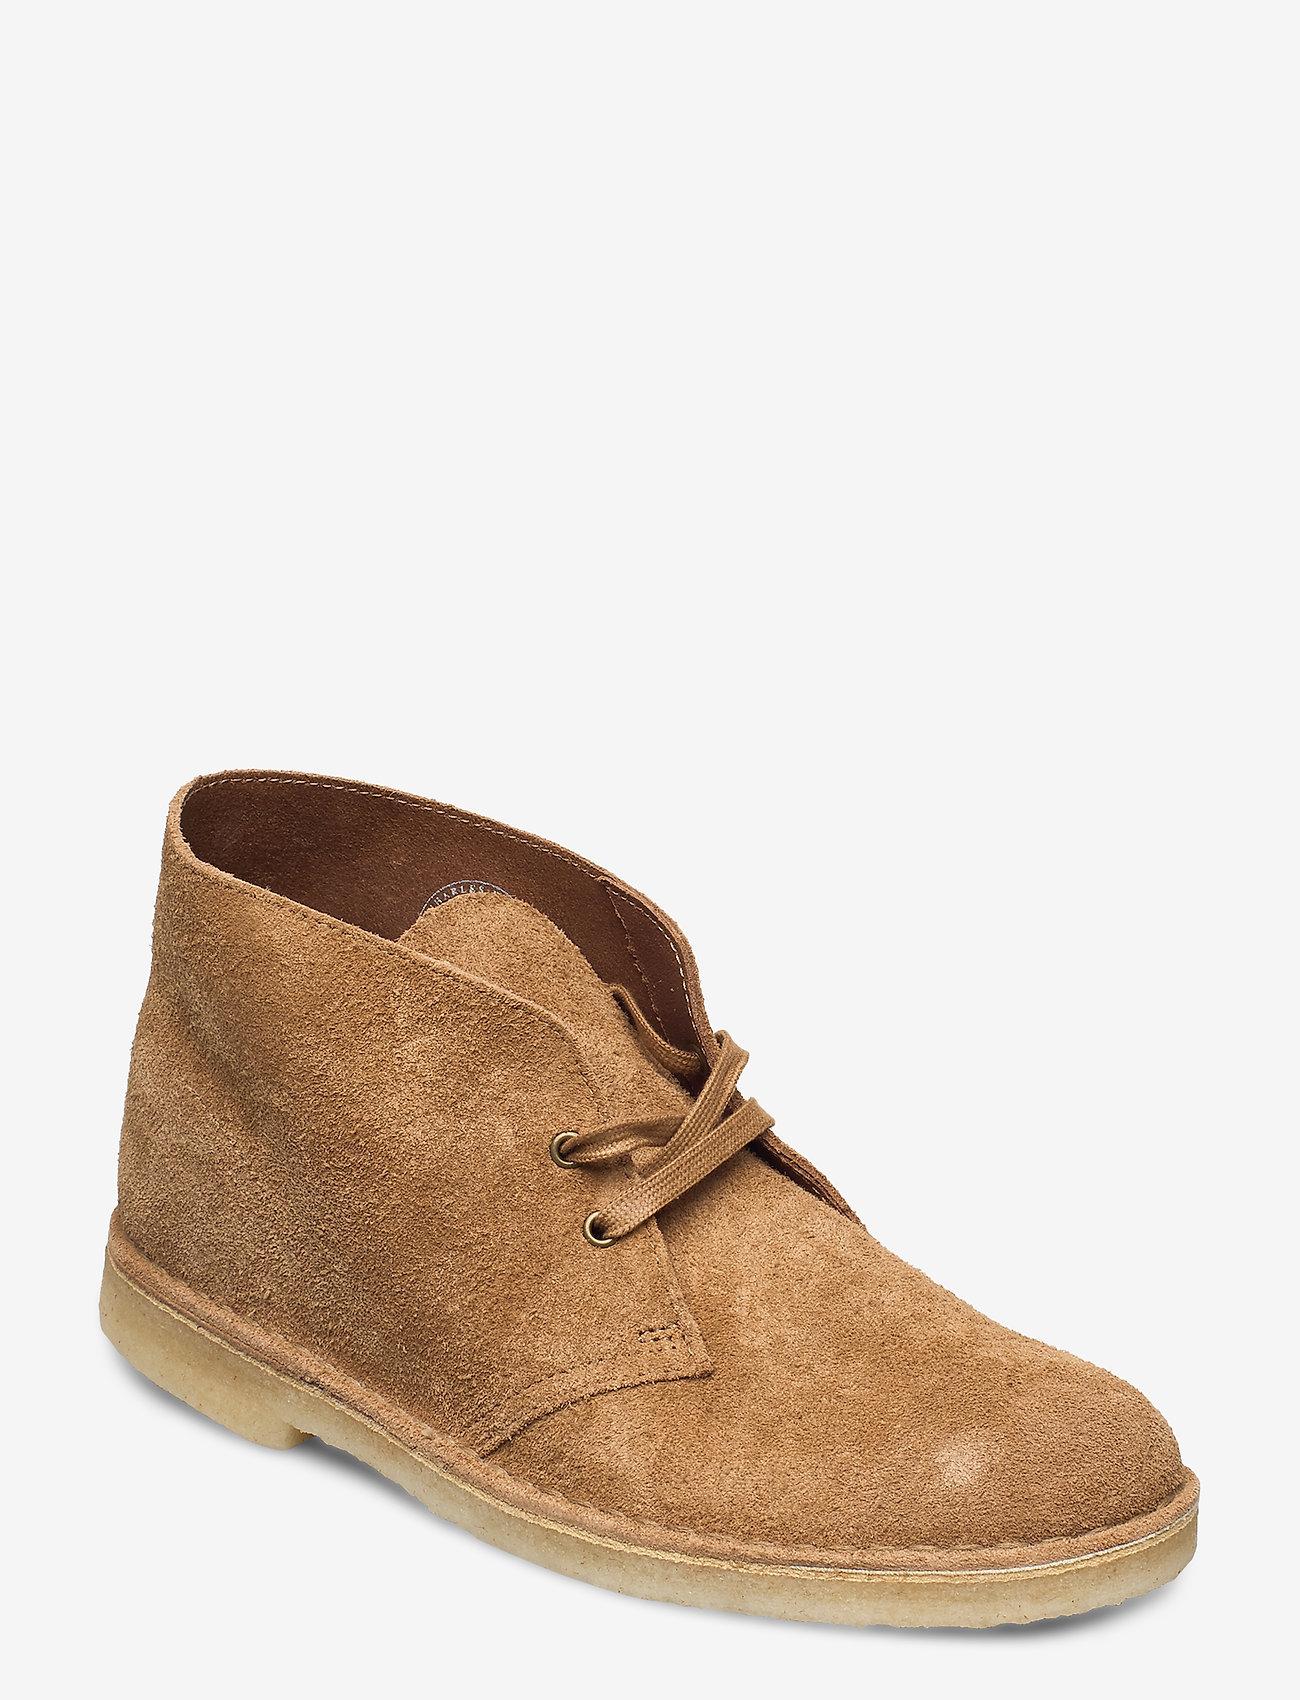 Clarks Originals - Desert Boot - desert boots - nutmeg suede - 0